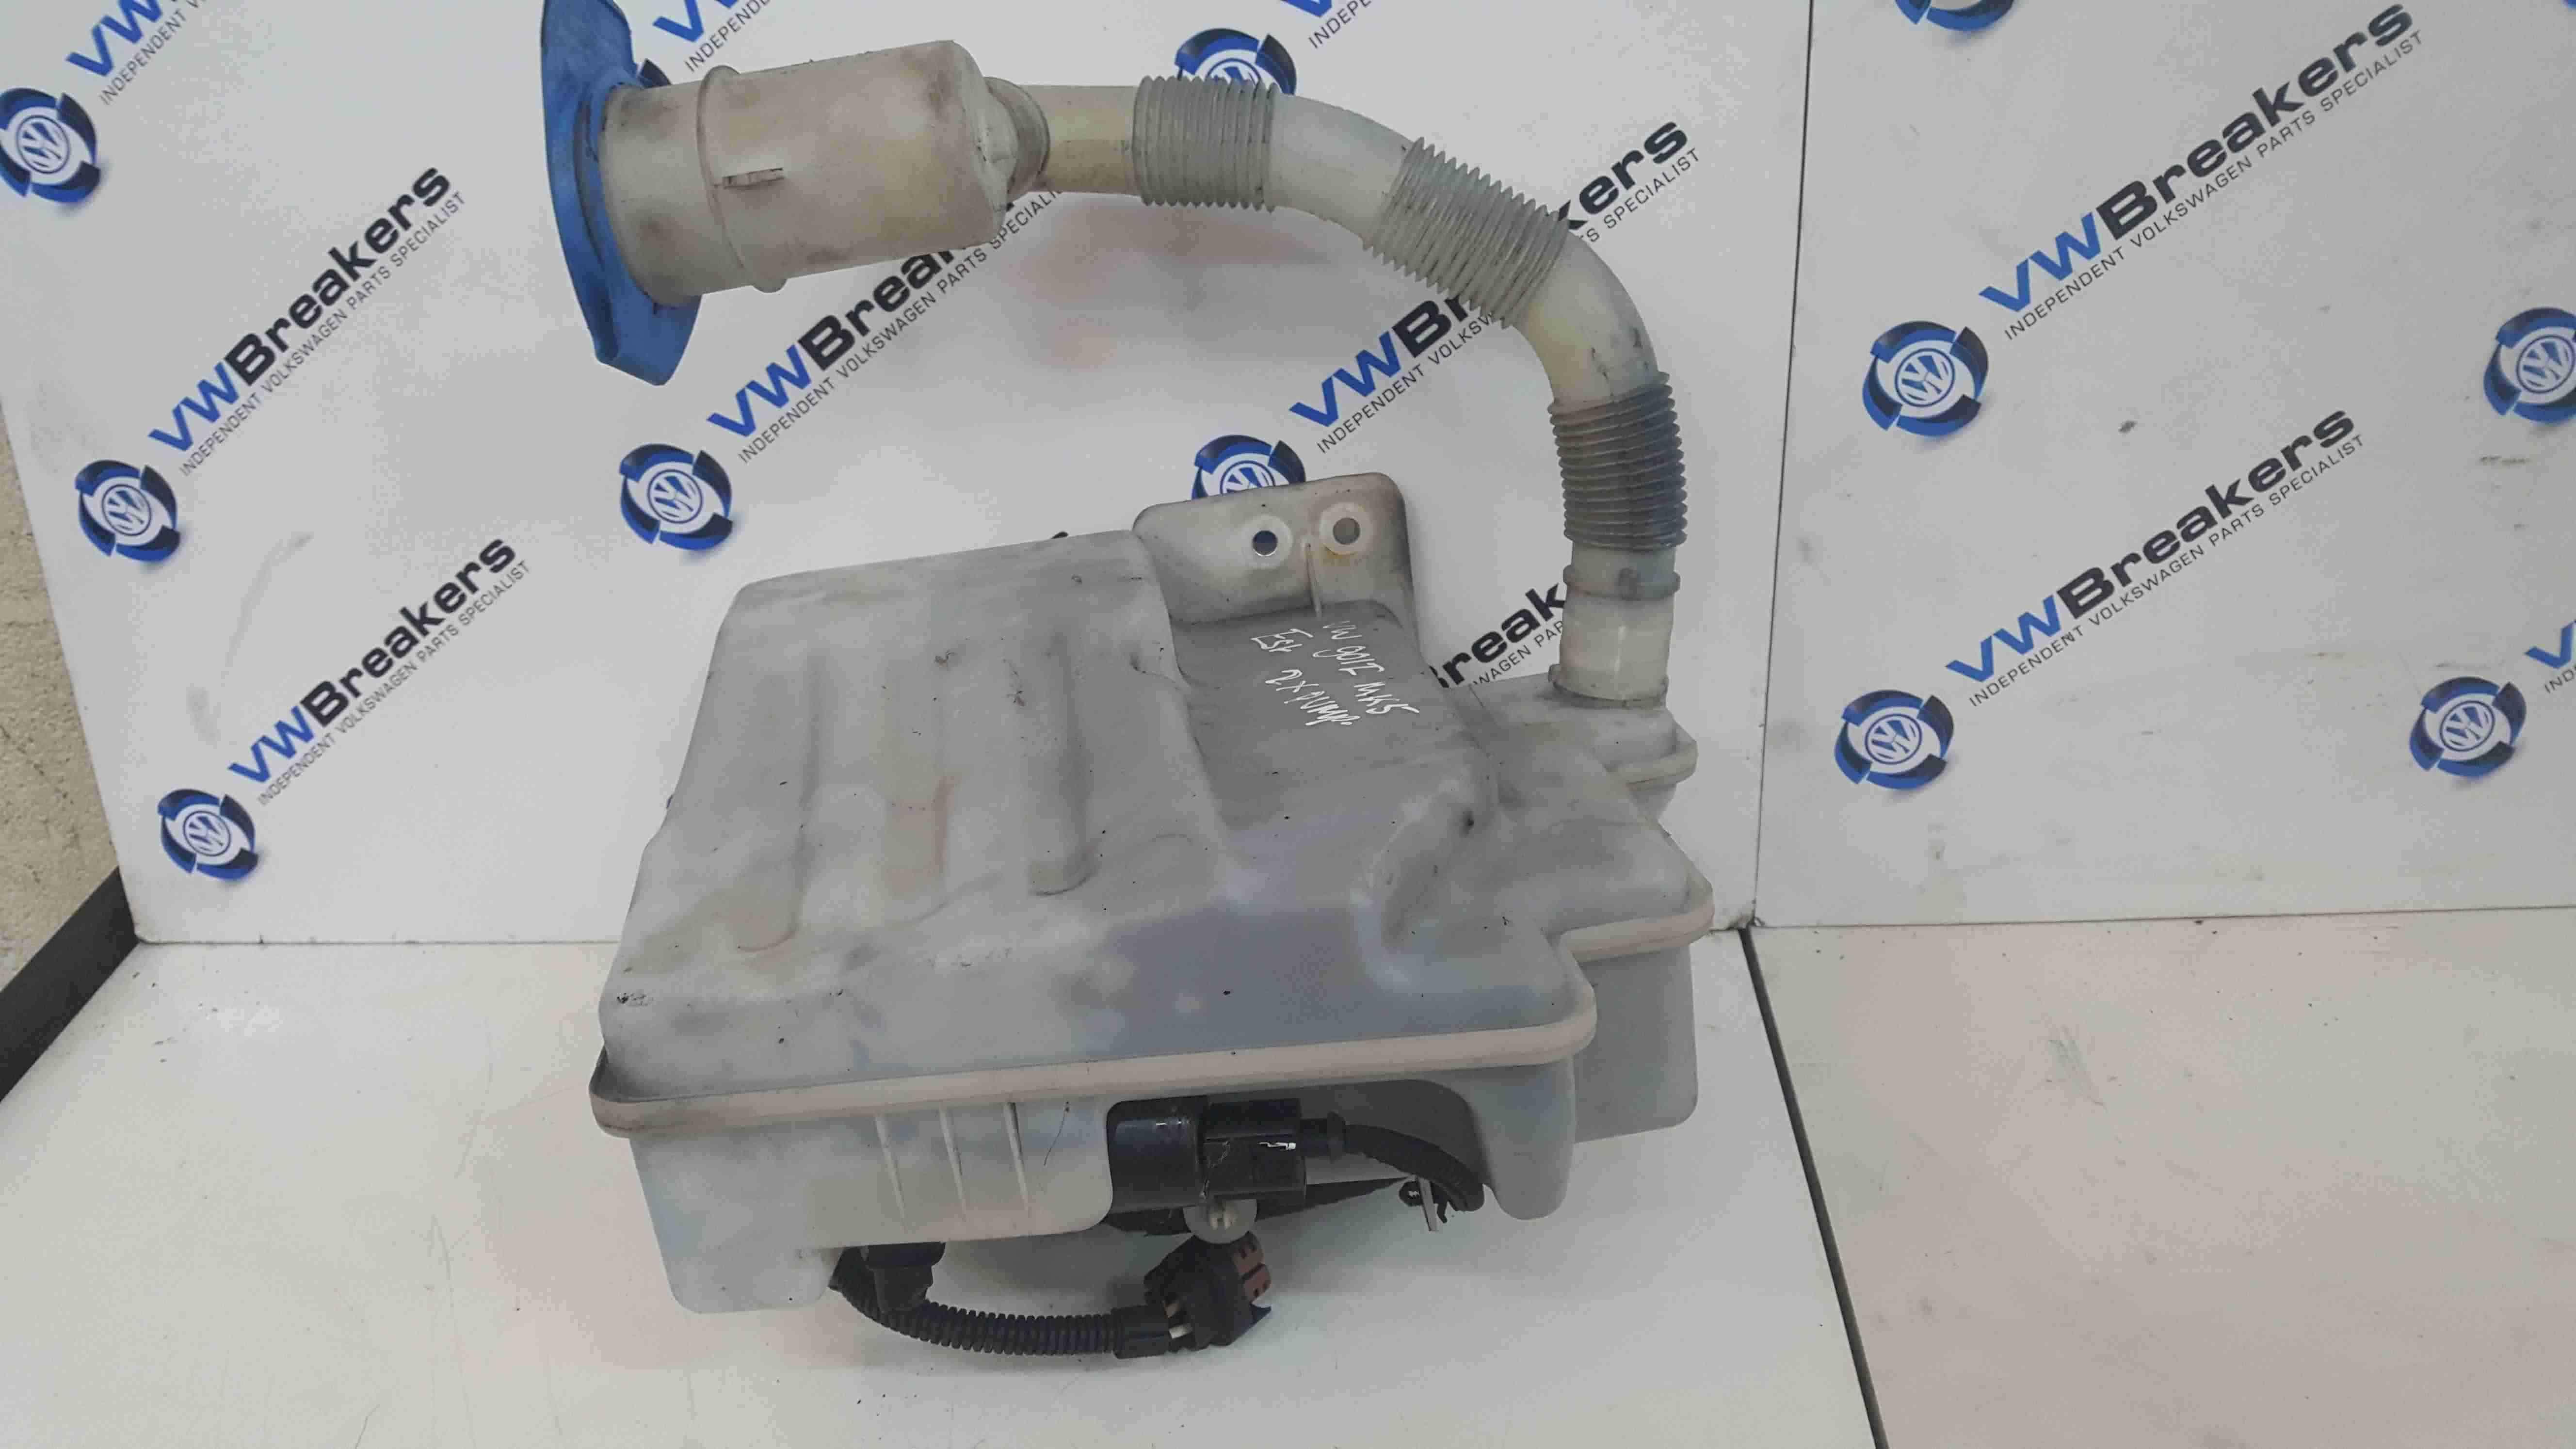 Volkswagen Golf MK5 2003-2009 Windscreen Washer Bottle 2 Pumps Headlight